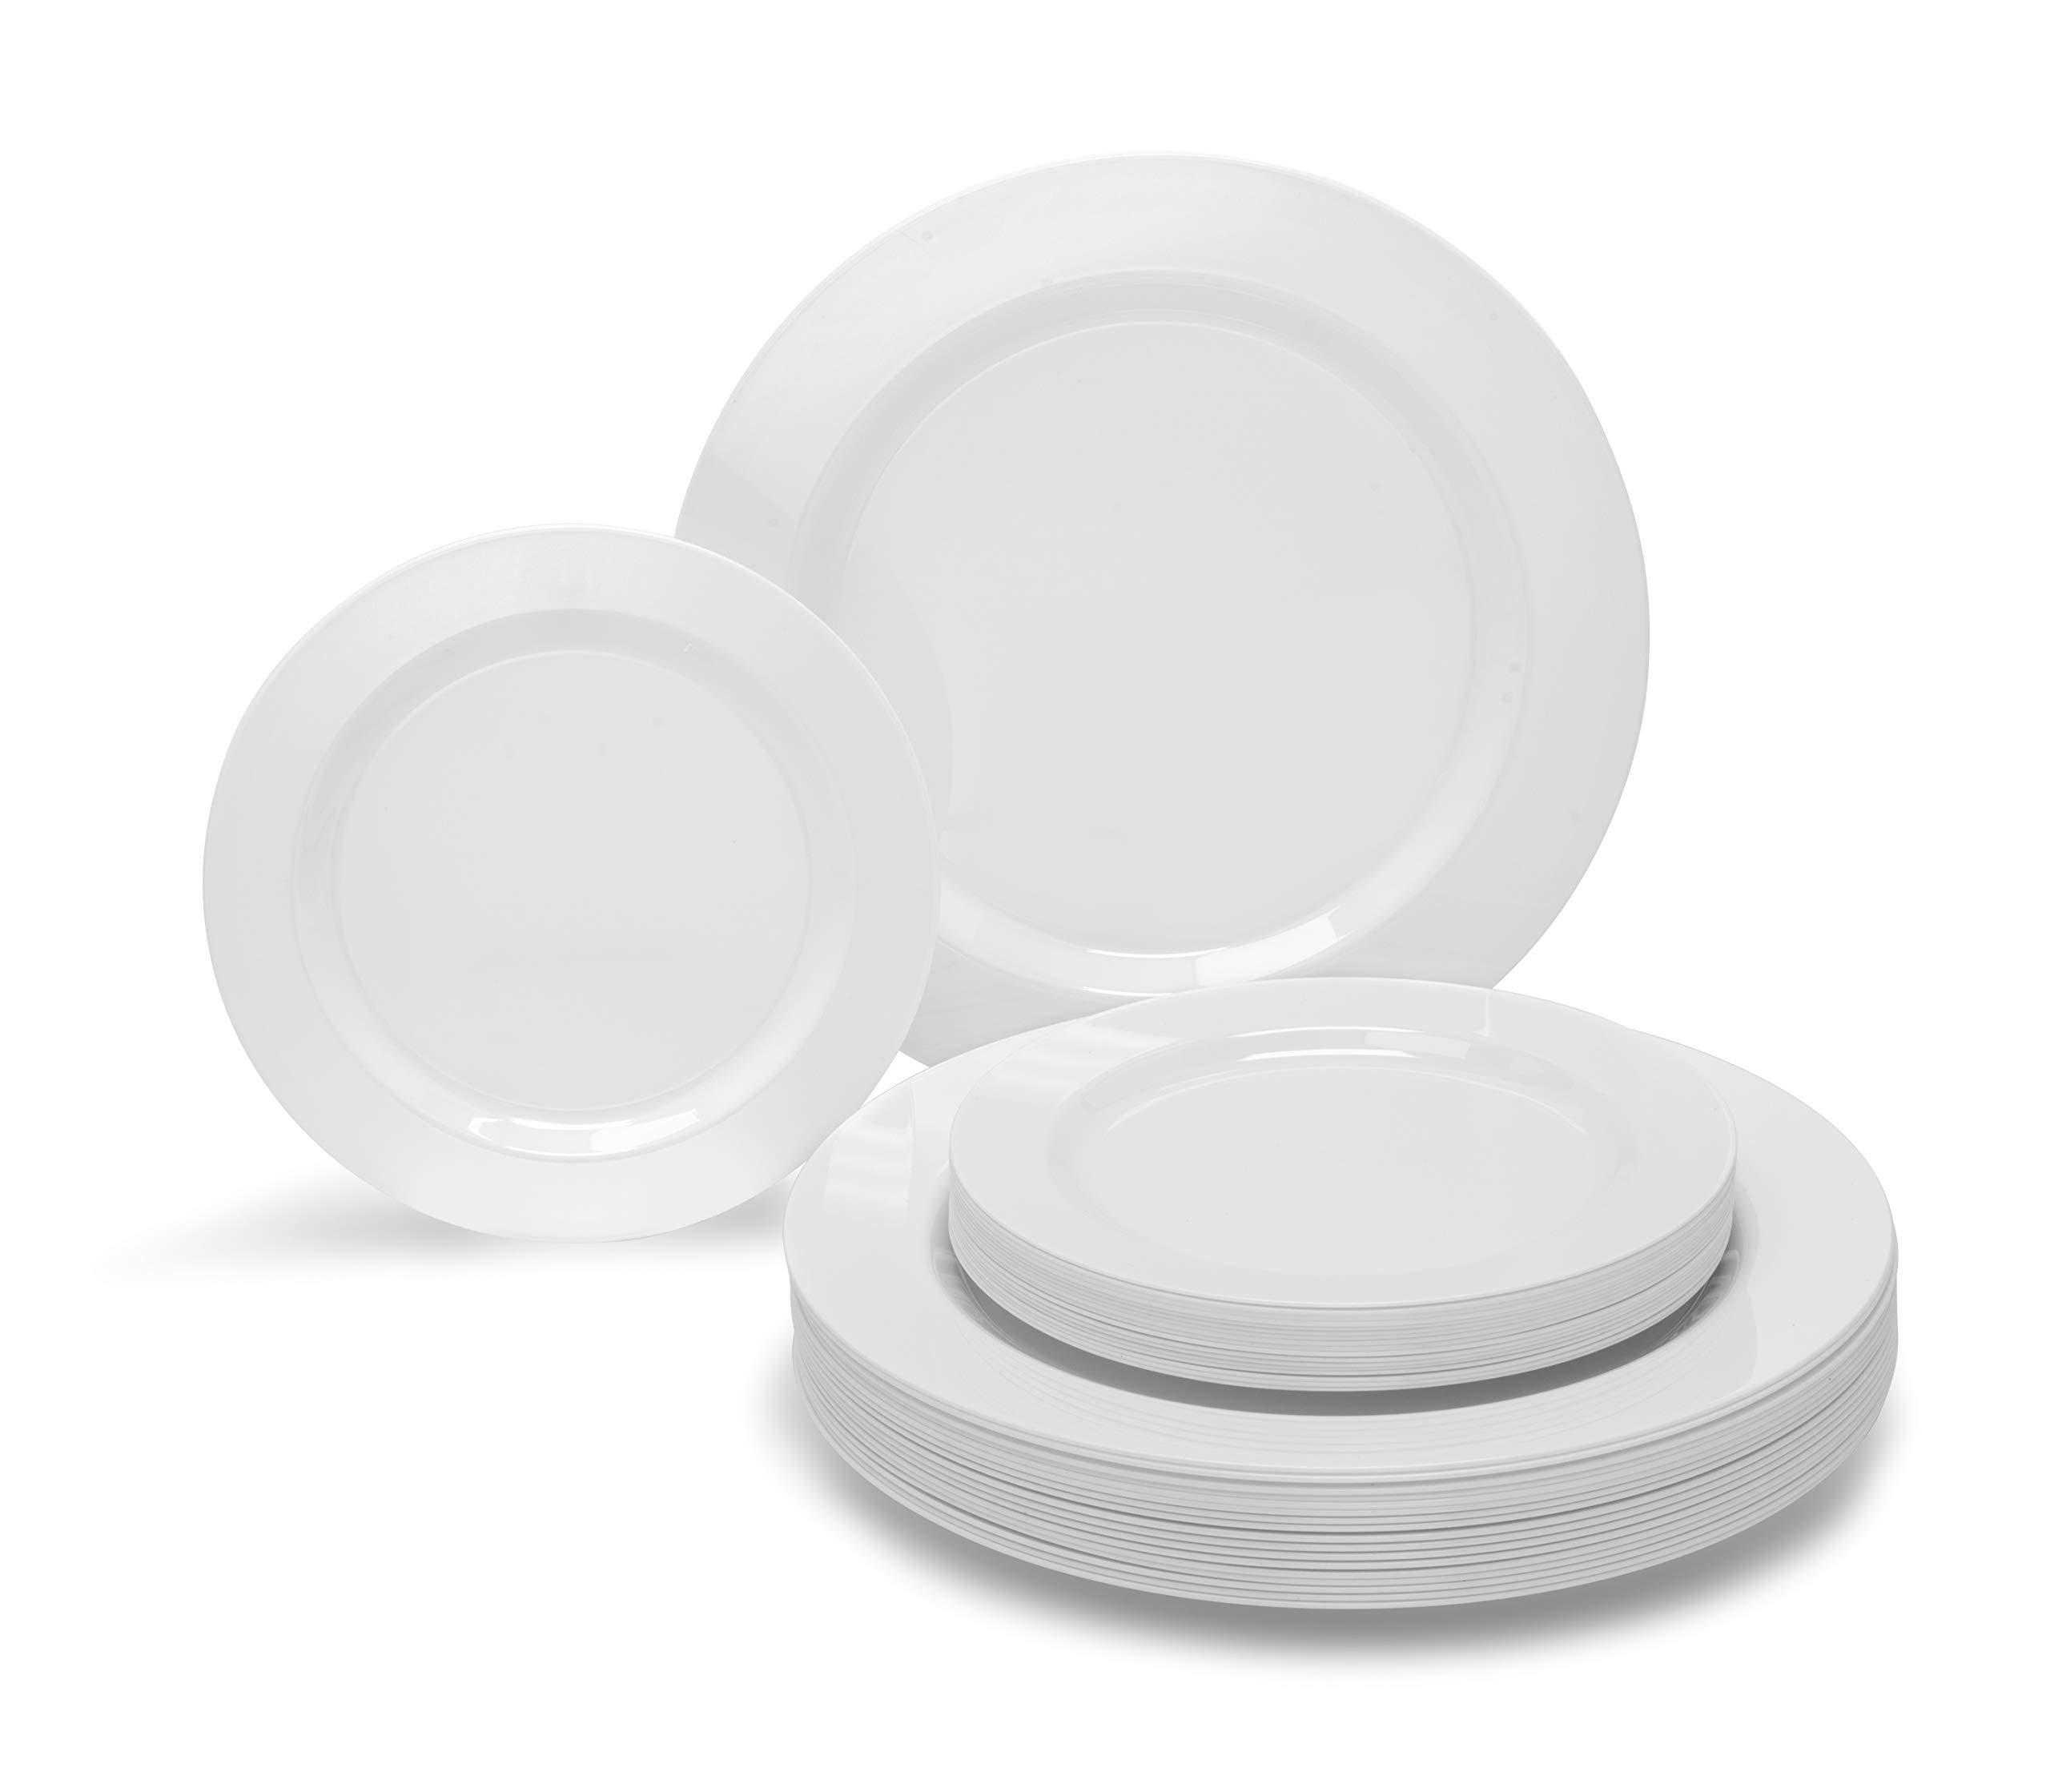 '' OCCASIONS'' 240 PACK Disposable Plastic Plates Set - 120 x 10.5'' Dinner + 120 x 7.5'' Salad/Dessert Plate (Plain White)